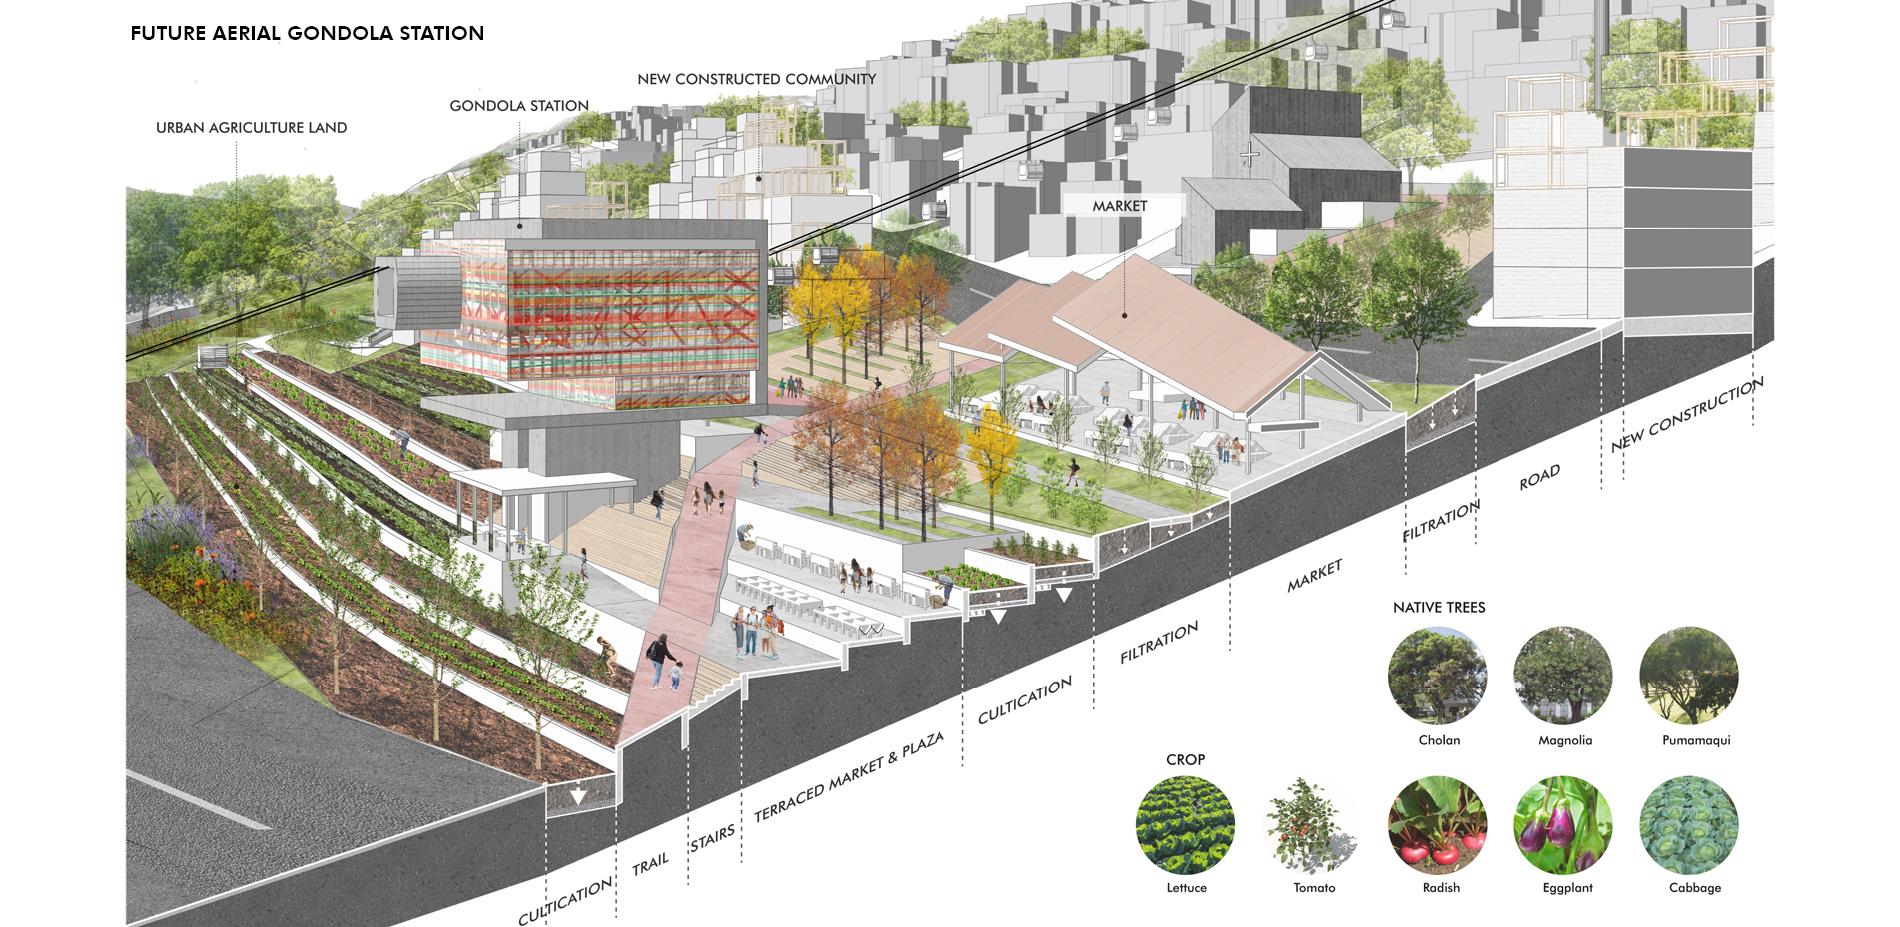 Future Aerial Gondola Station